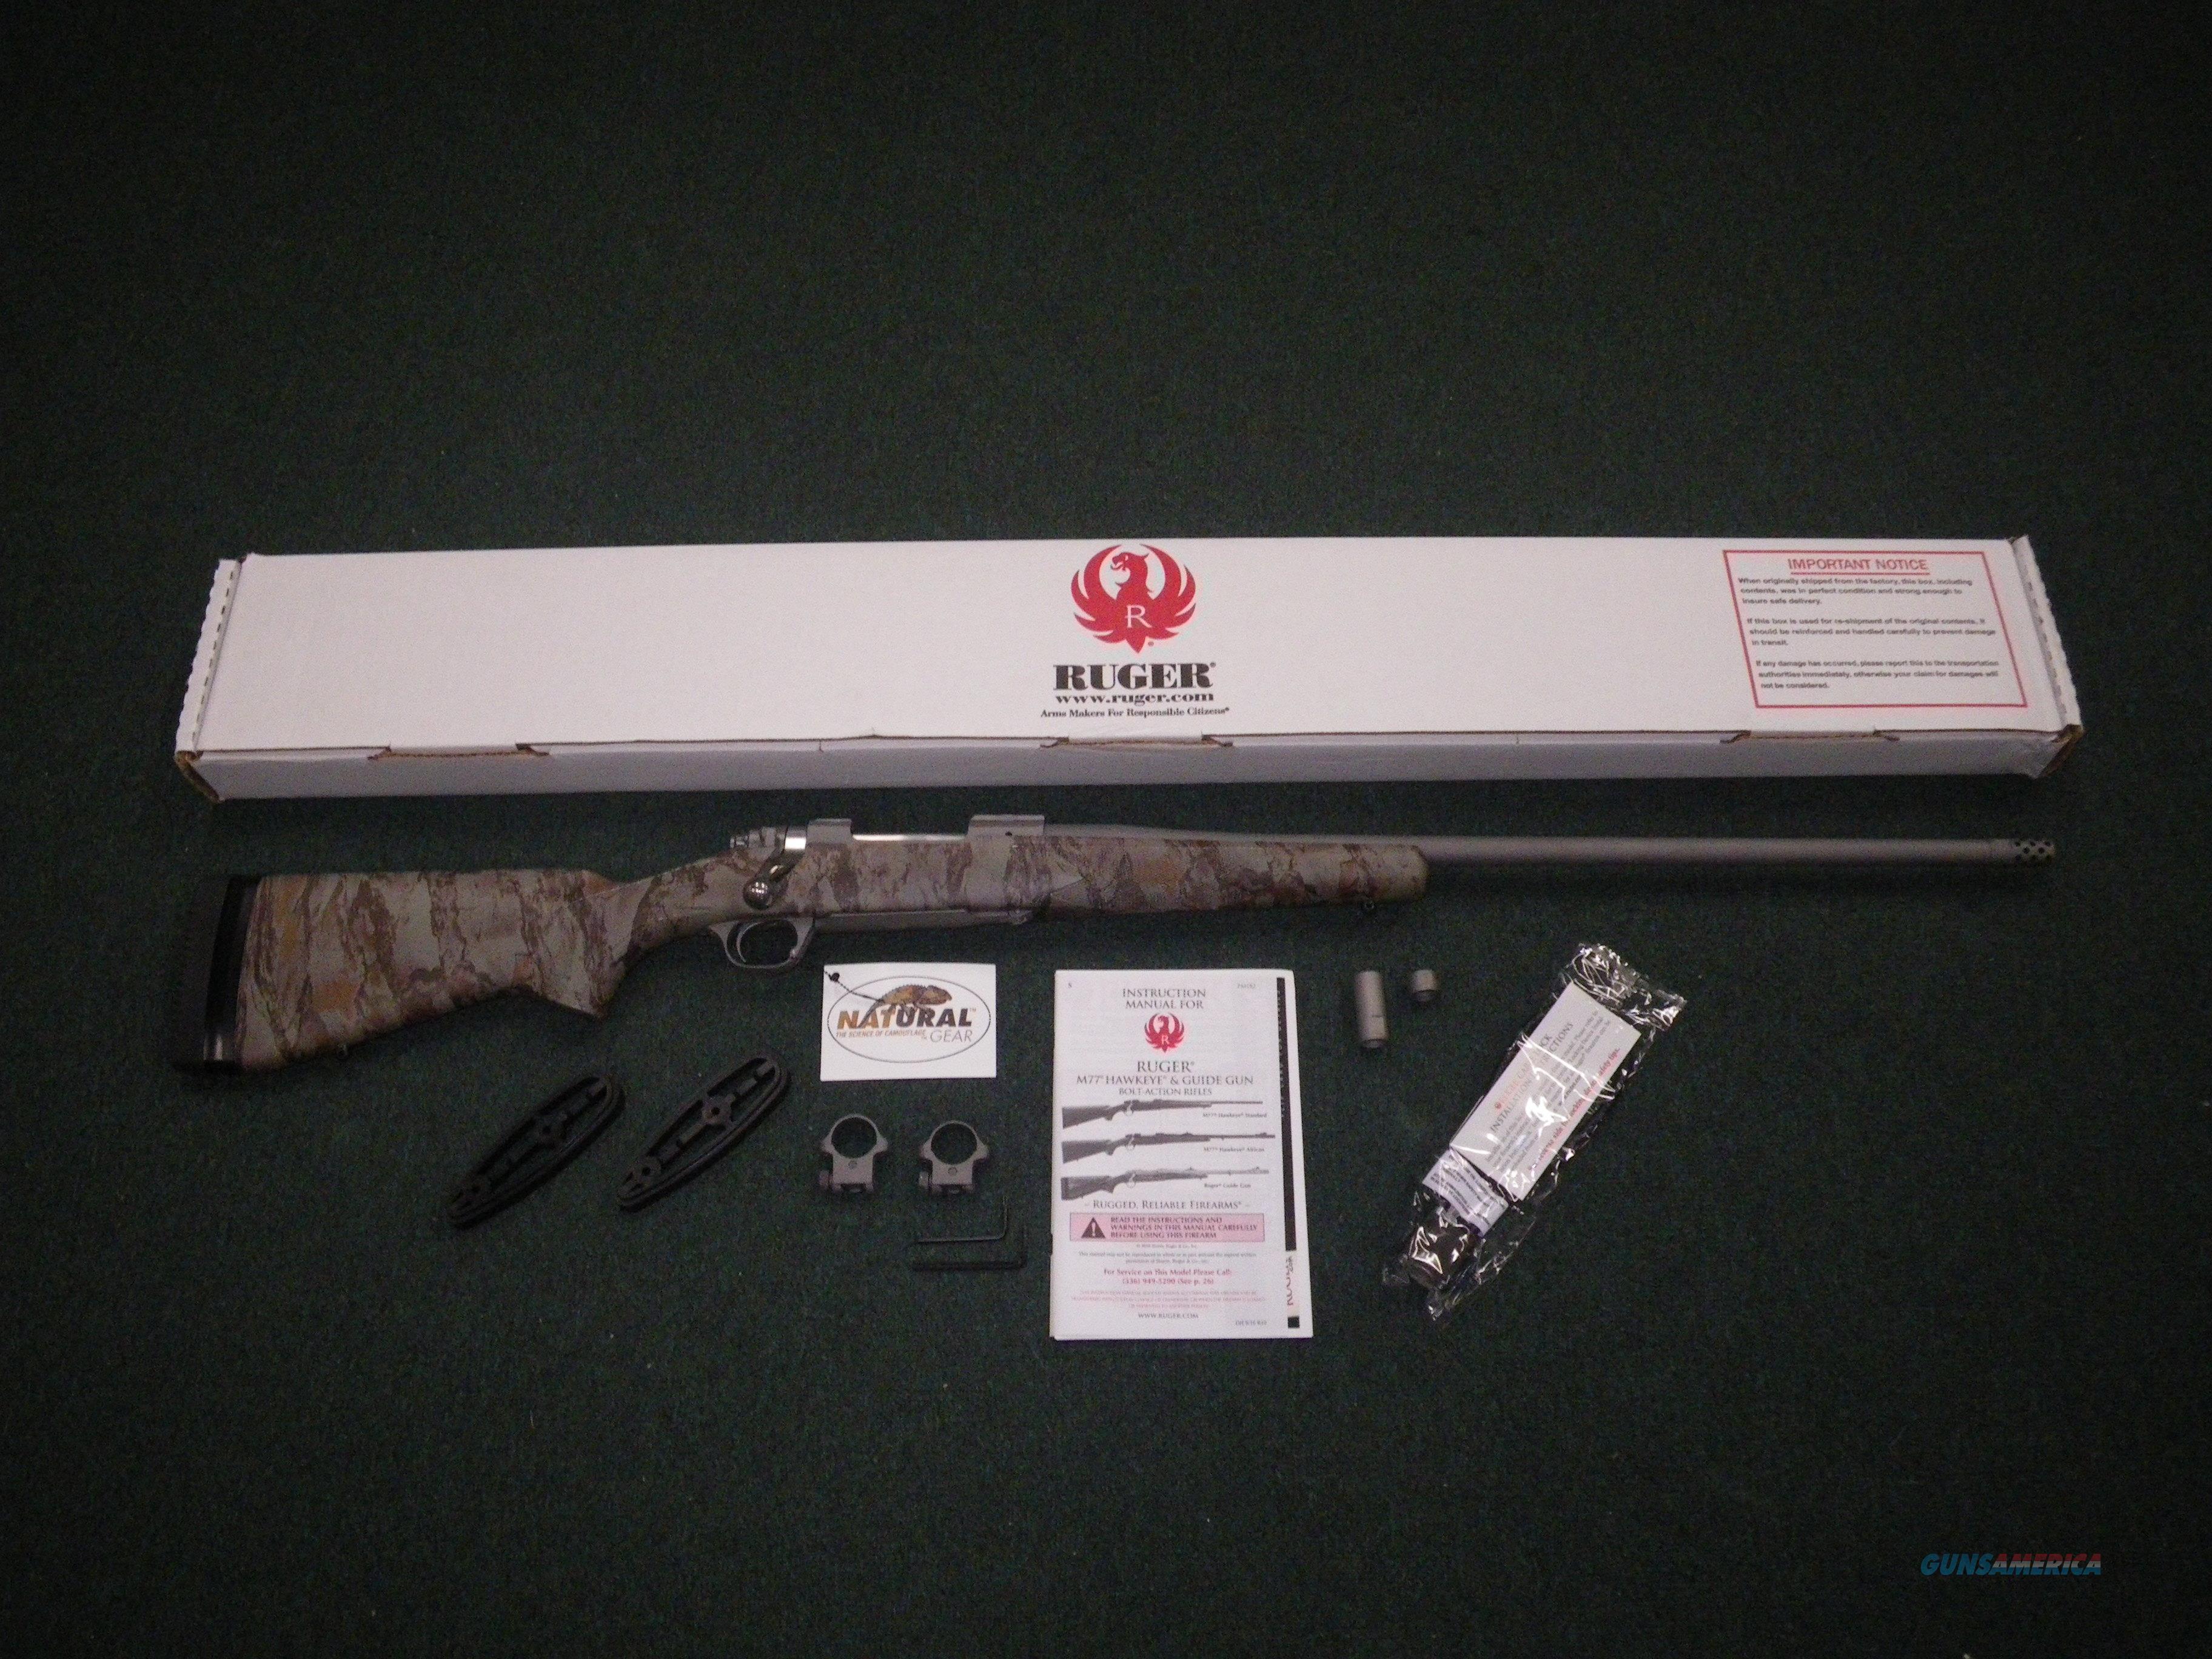 "Ruger Hawkeye FTW Hunter Rifle 6.5 Creed 24"" NEW #47170  Guns > Rifles > Ruger Rifles > Model 77"